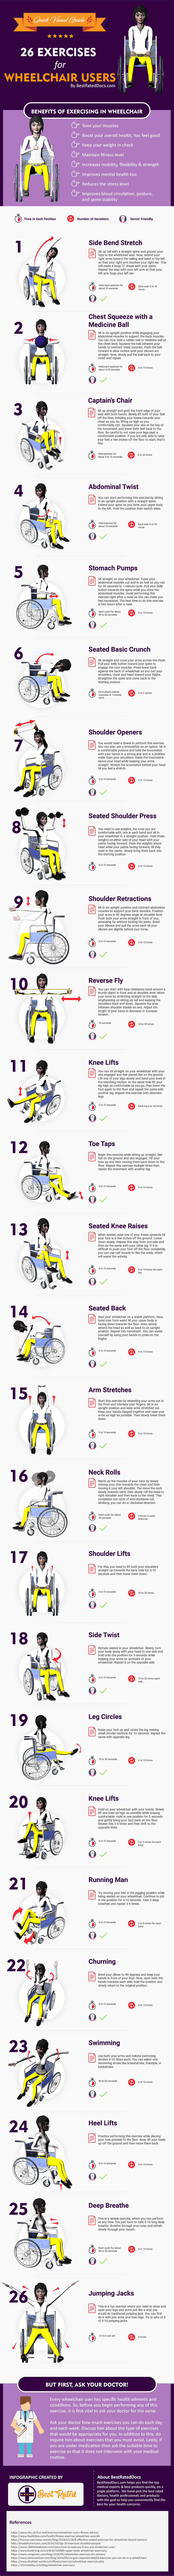 infographic on wheelchair exercises